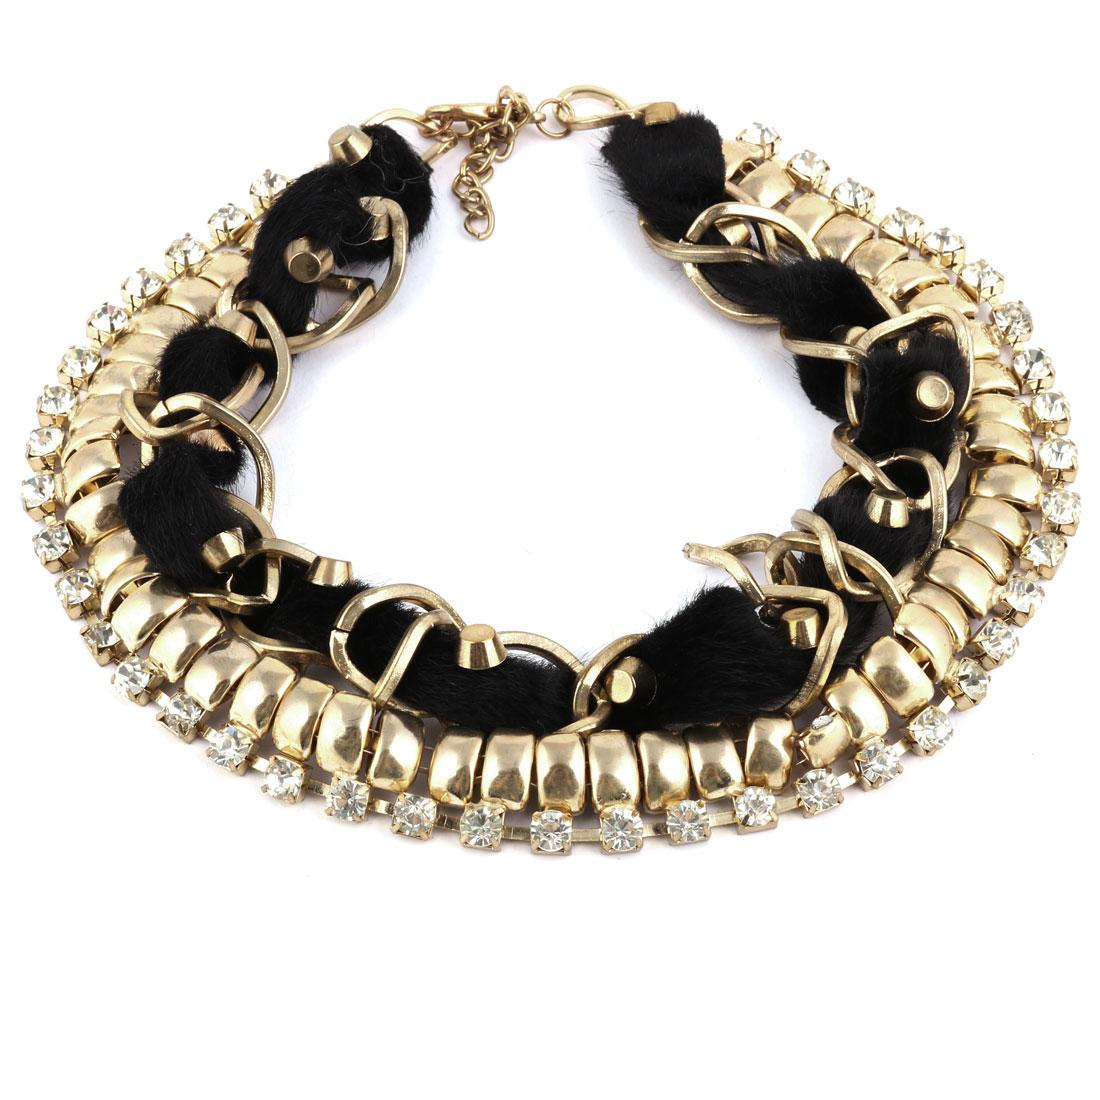 Artificial Fur Ribbon Rhinestone Inlaid Neck Chain Collar Necklace Choker